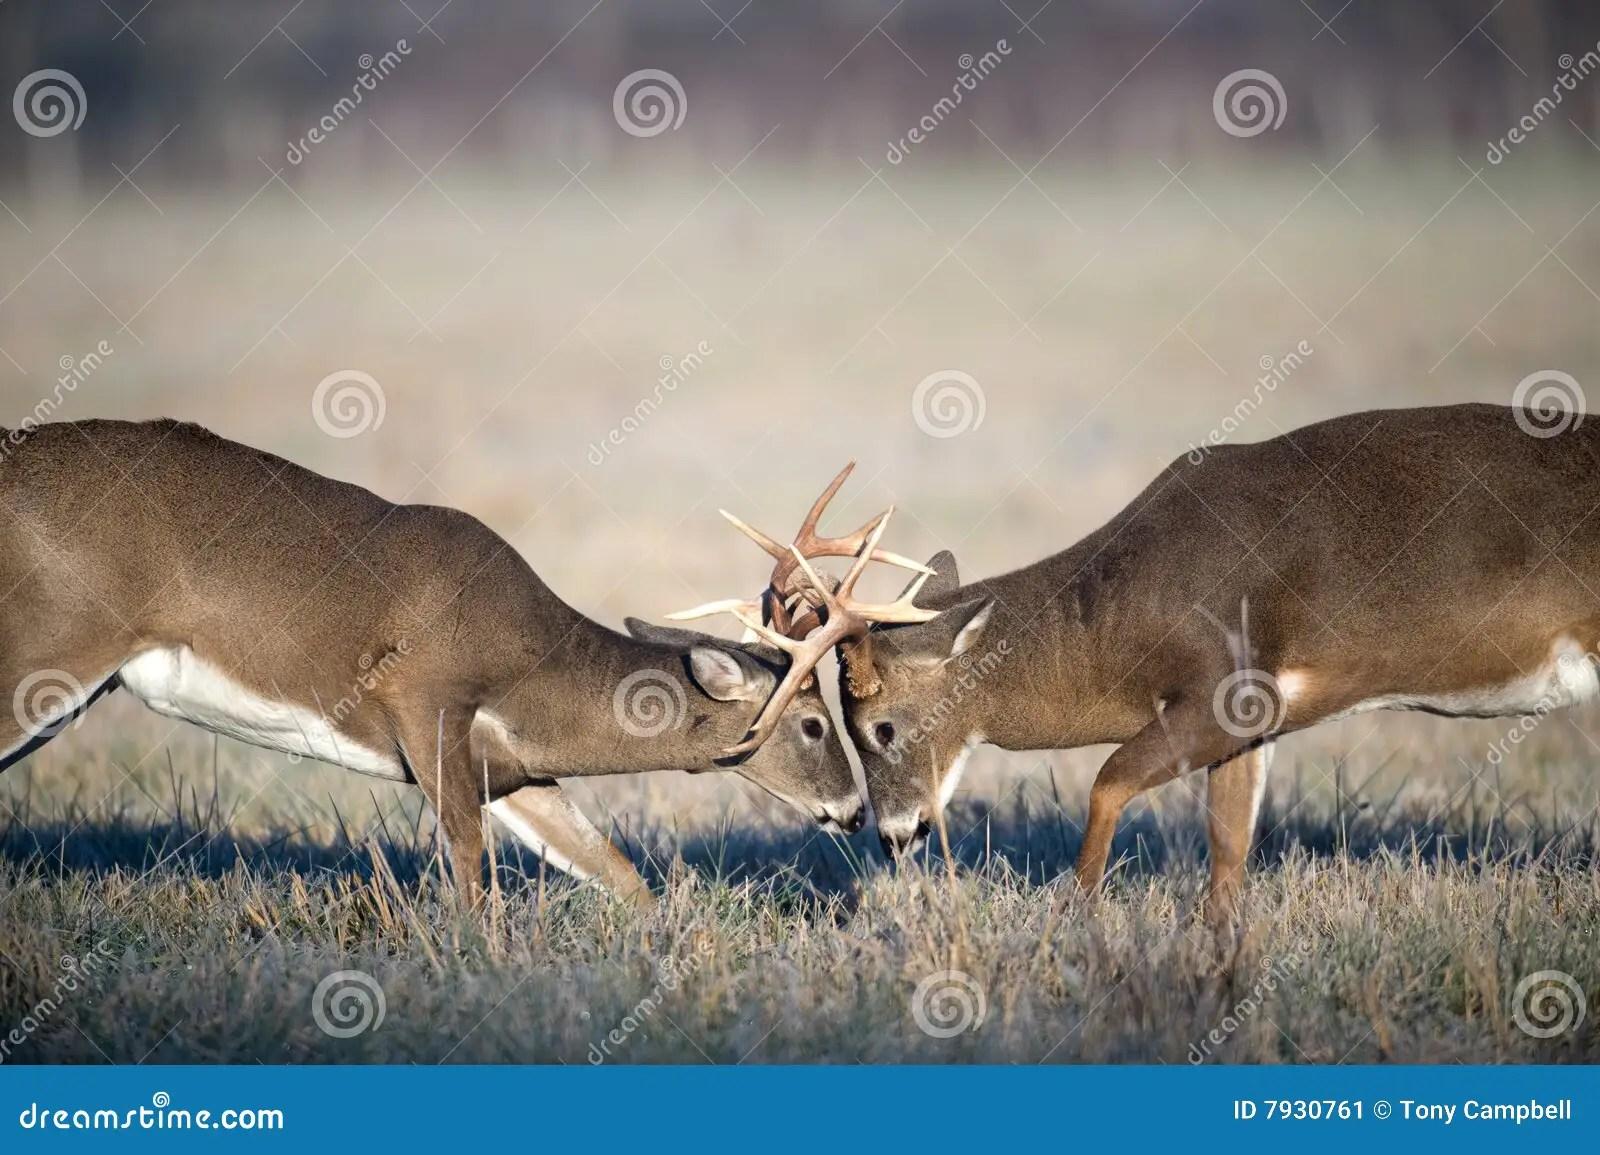 Fall Wallpaper Hd Free Whitetail Deer Fighting Stock Image Image 7930761